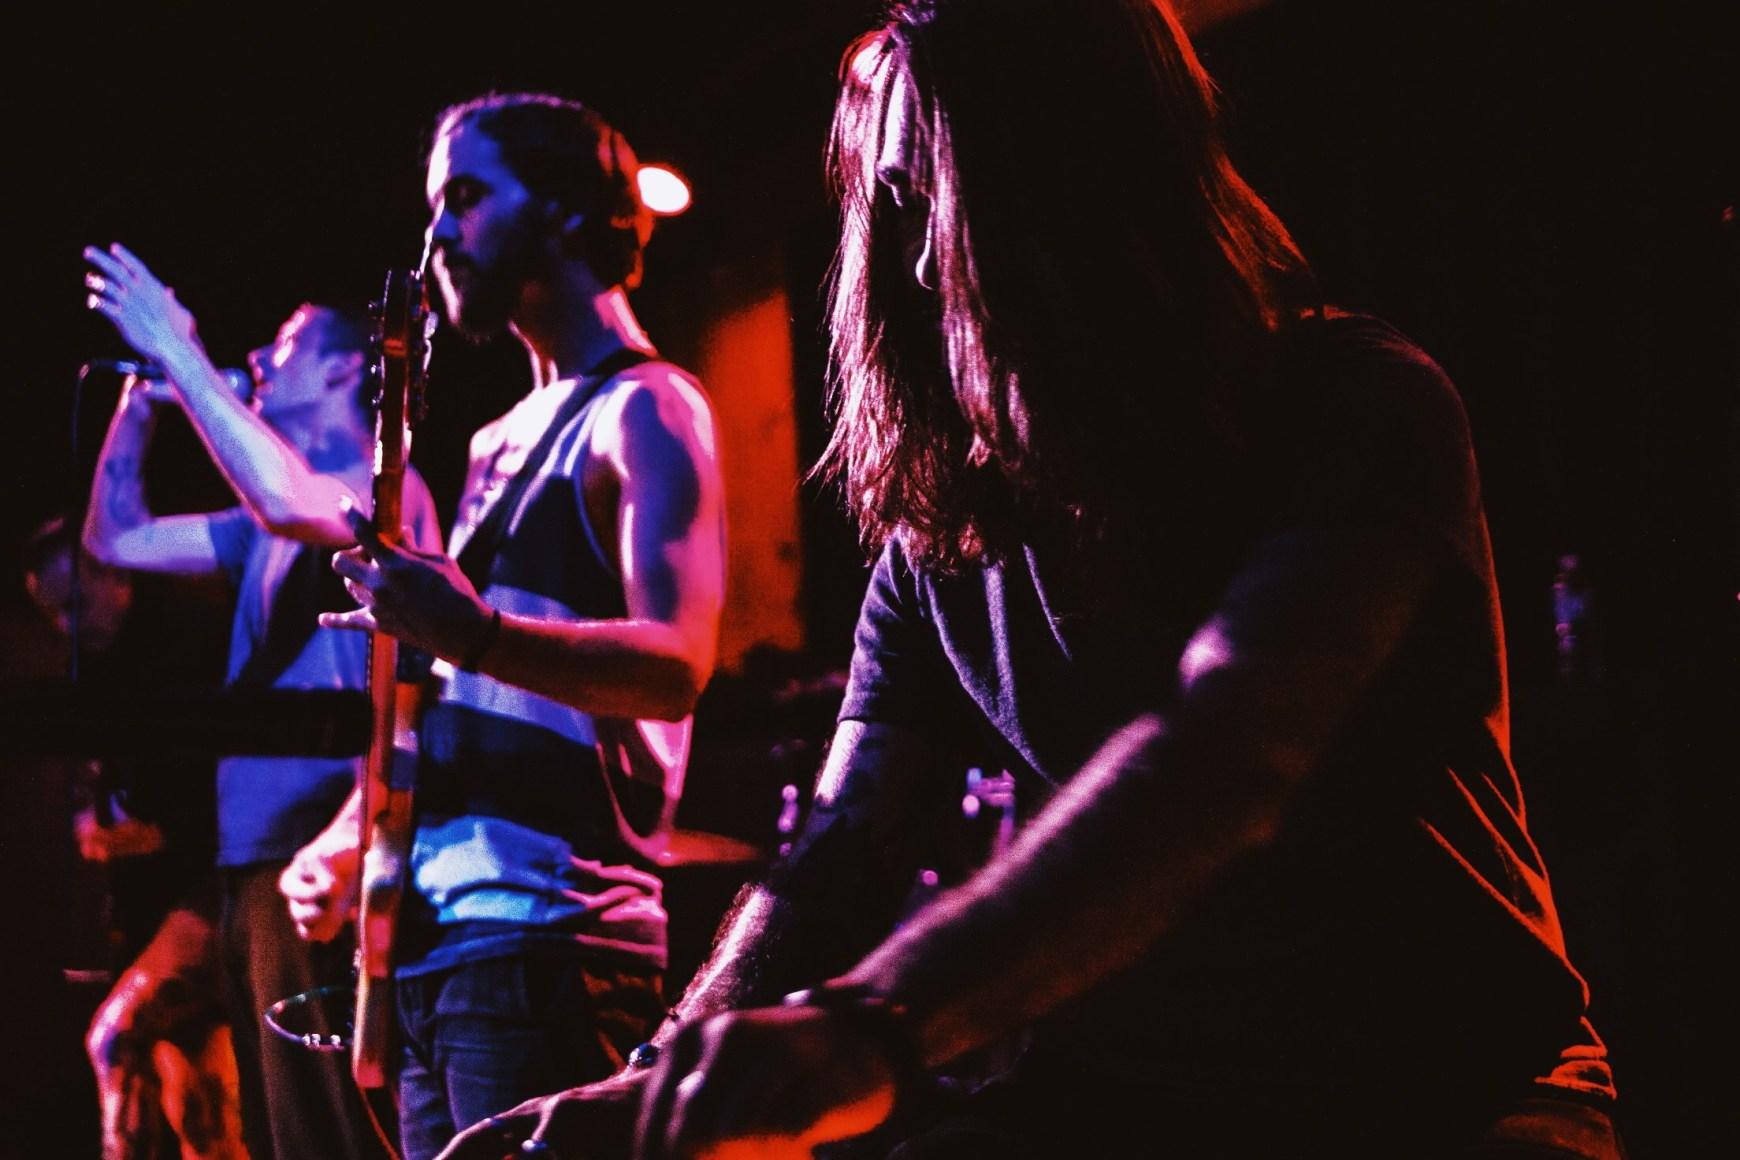 Sannhet performing at Barracuda in Austin, TX.